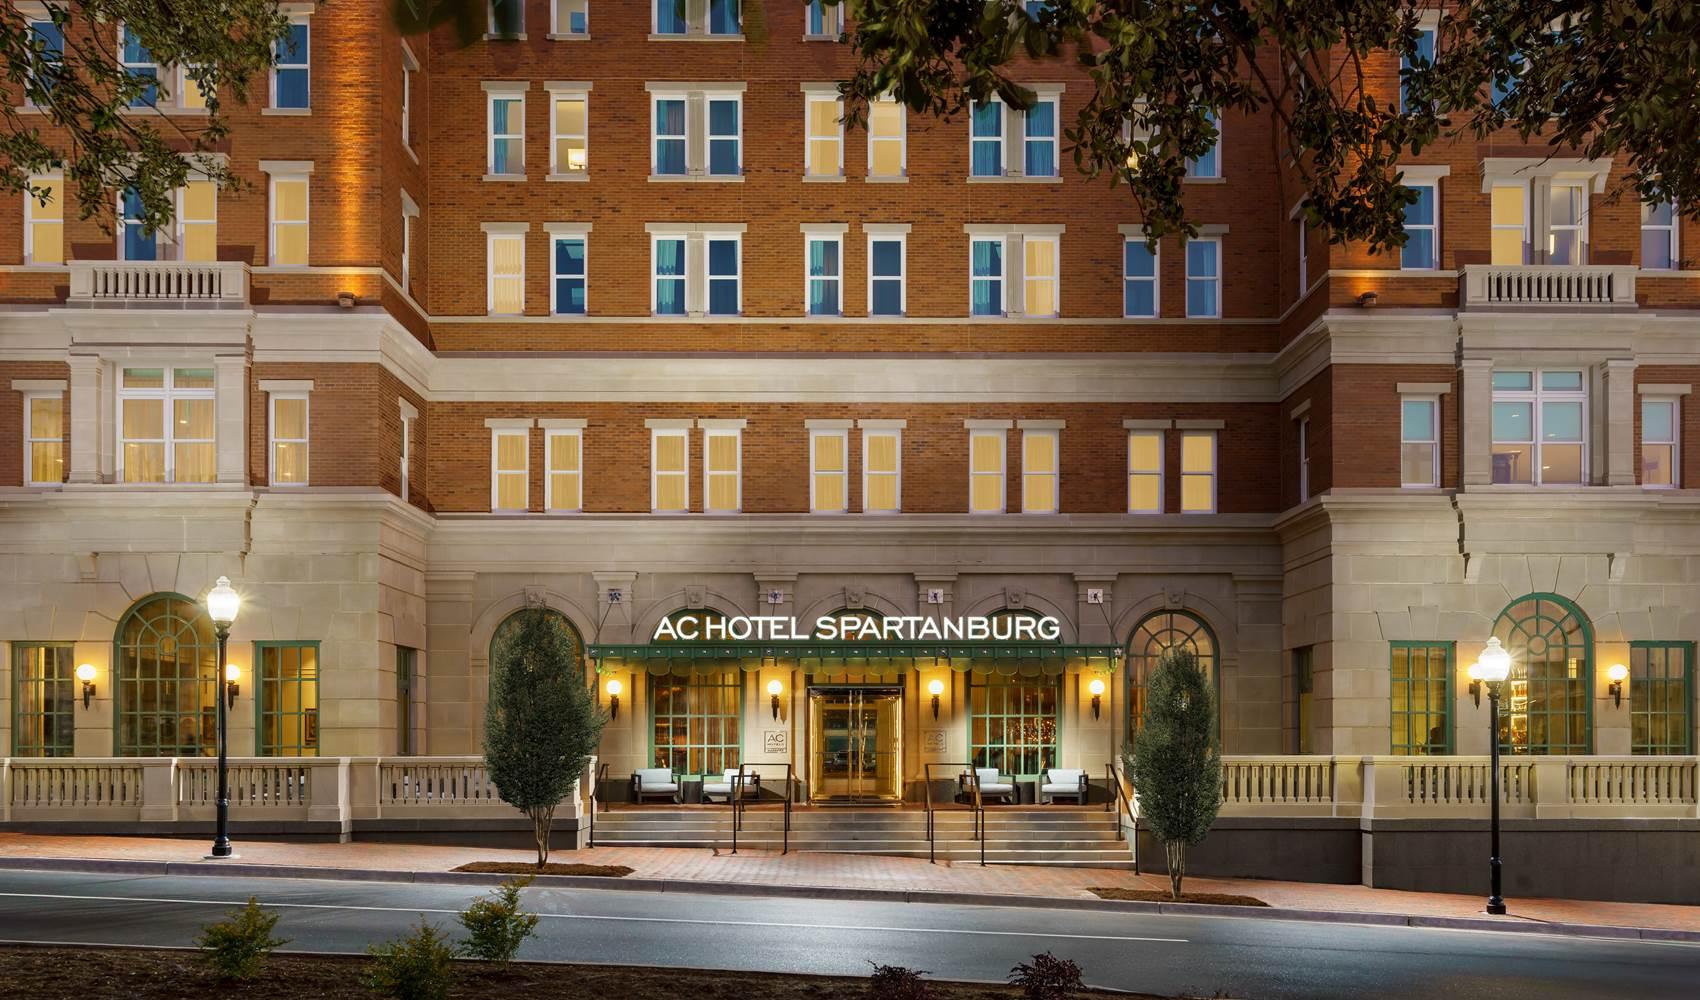 Entrance to A C Hotel Spartanburg